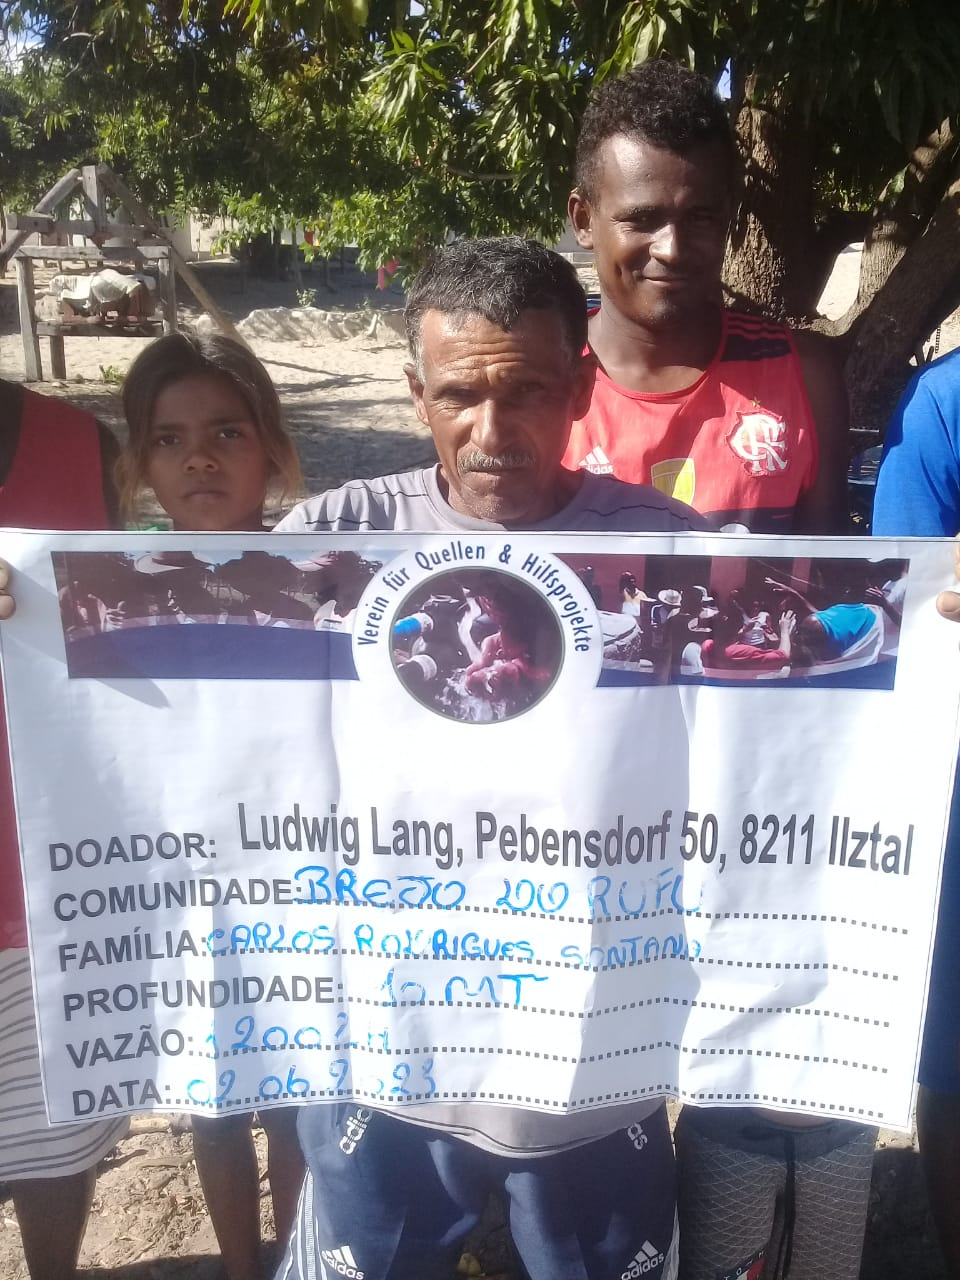 2021-06-02 Bahia - Image 1